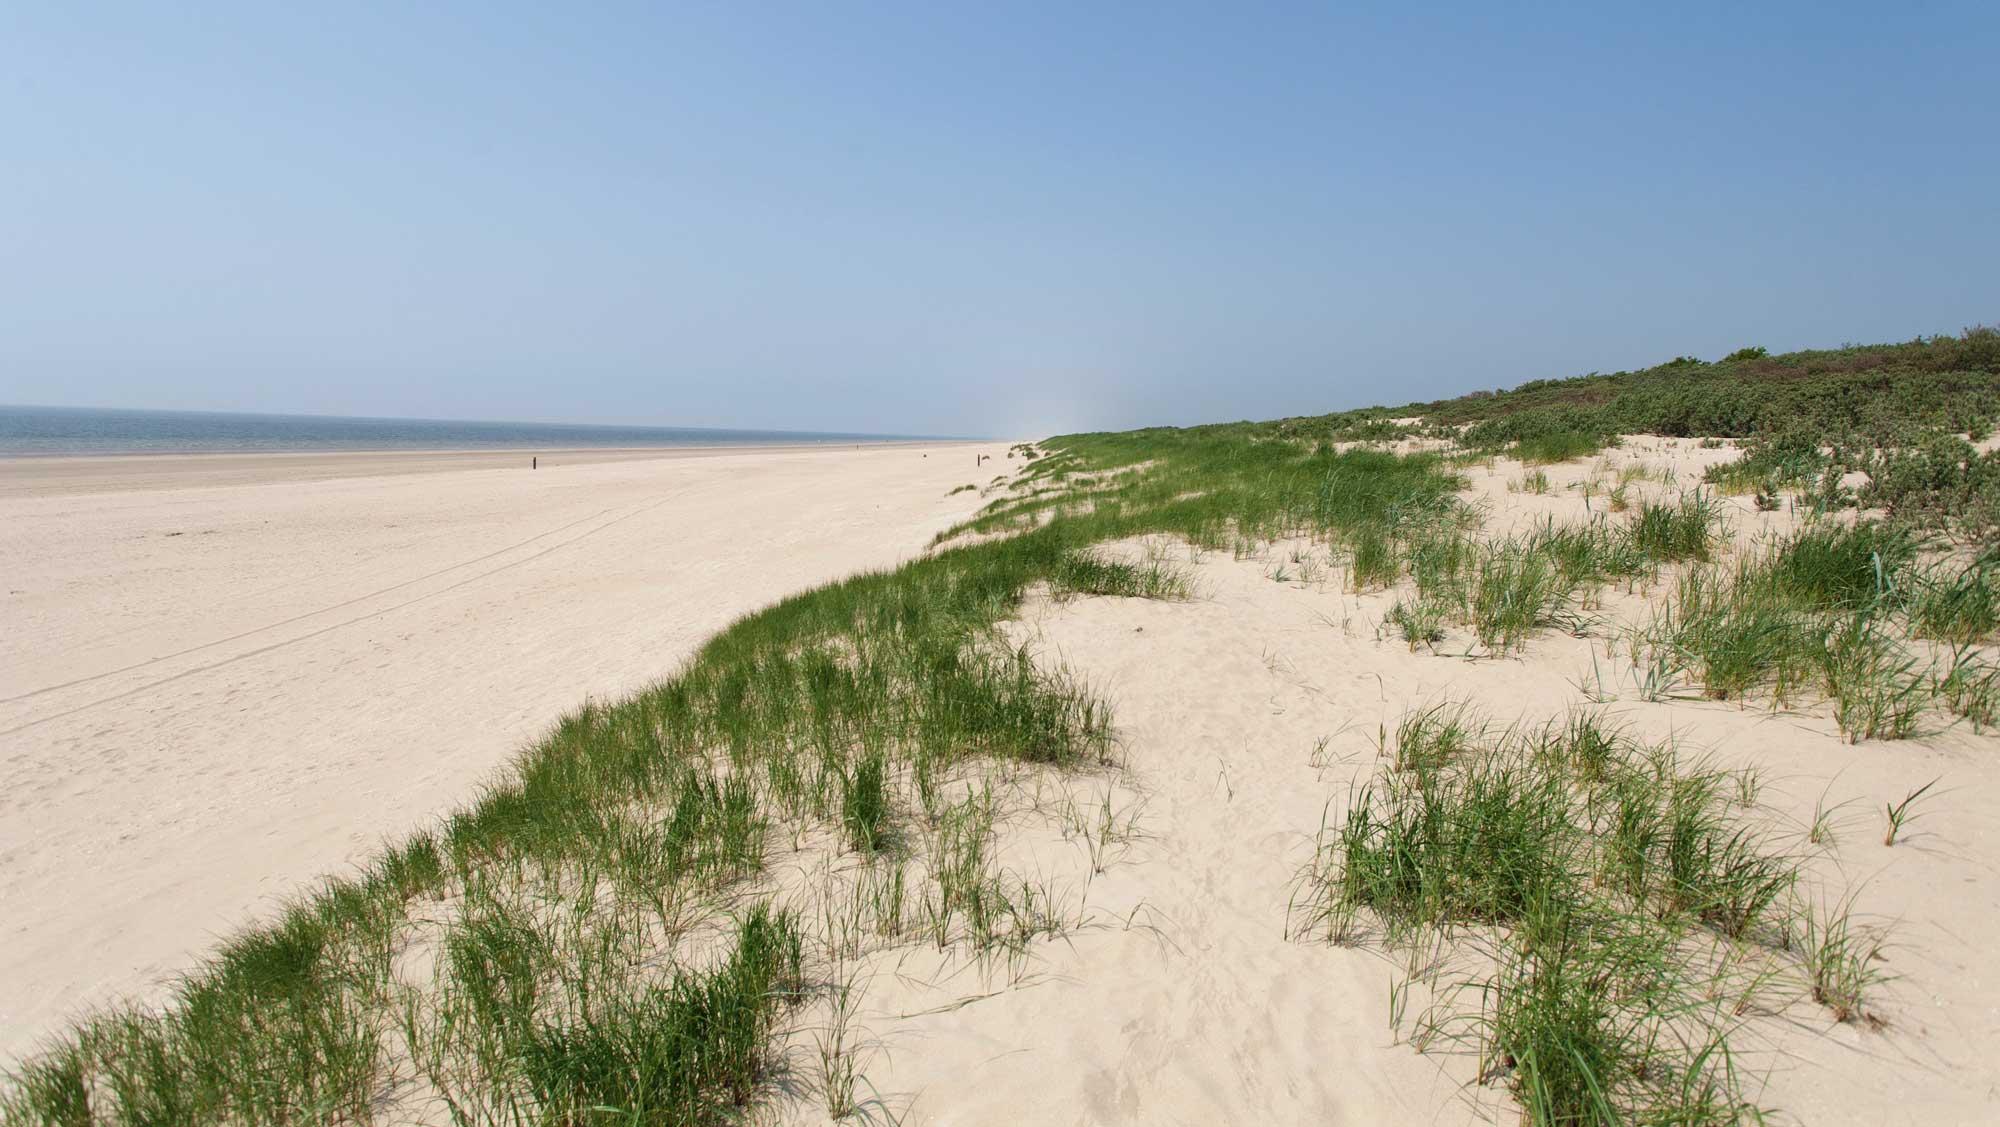 Omgeving Rockanje 22a strand